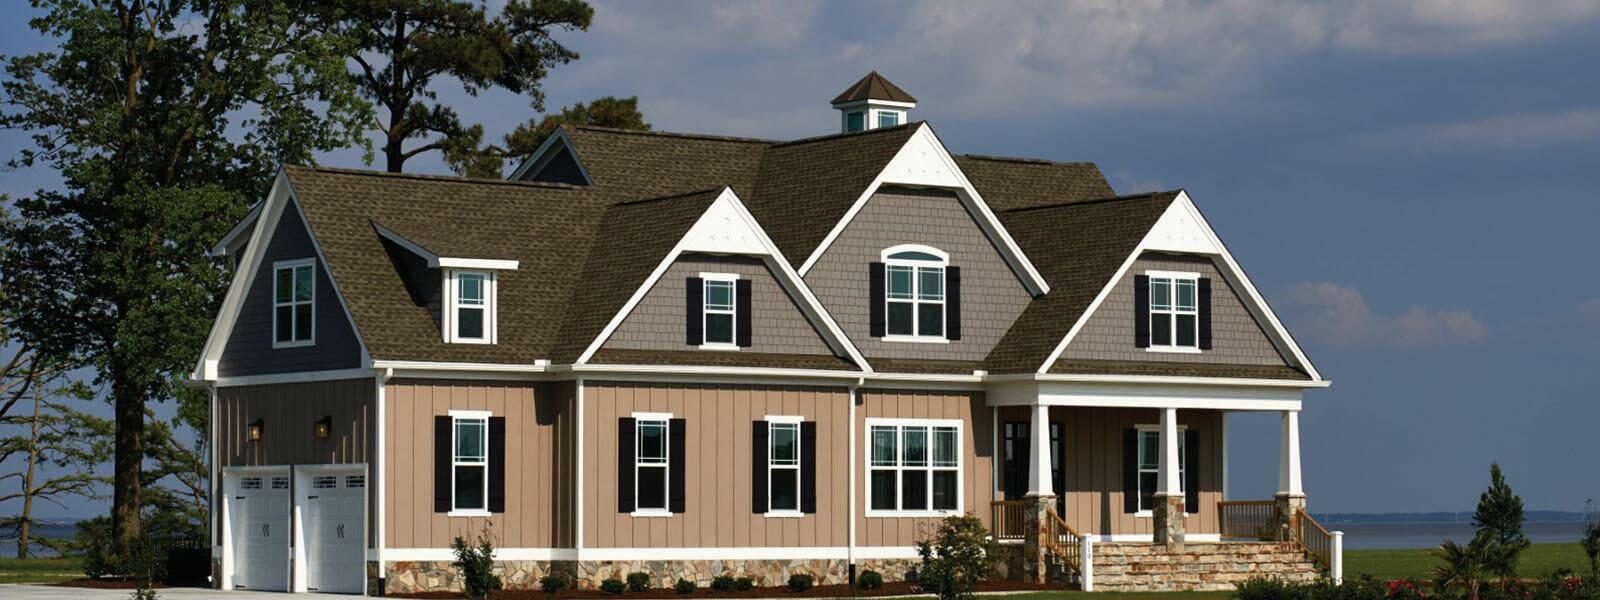 Scotch Hall Preserve | North Carolina Coastal Golf Community | Retire NC